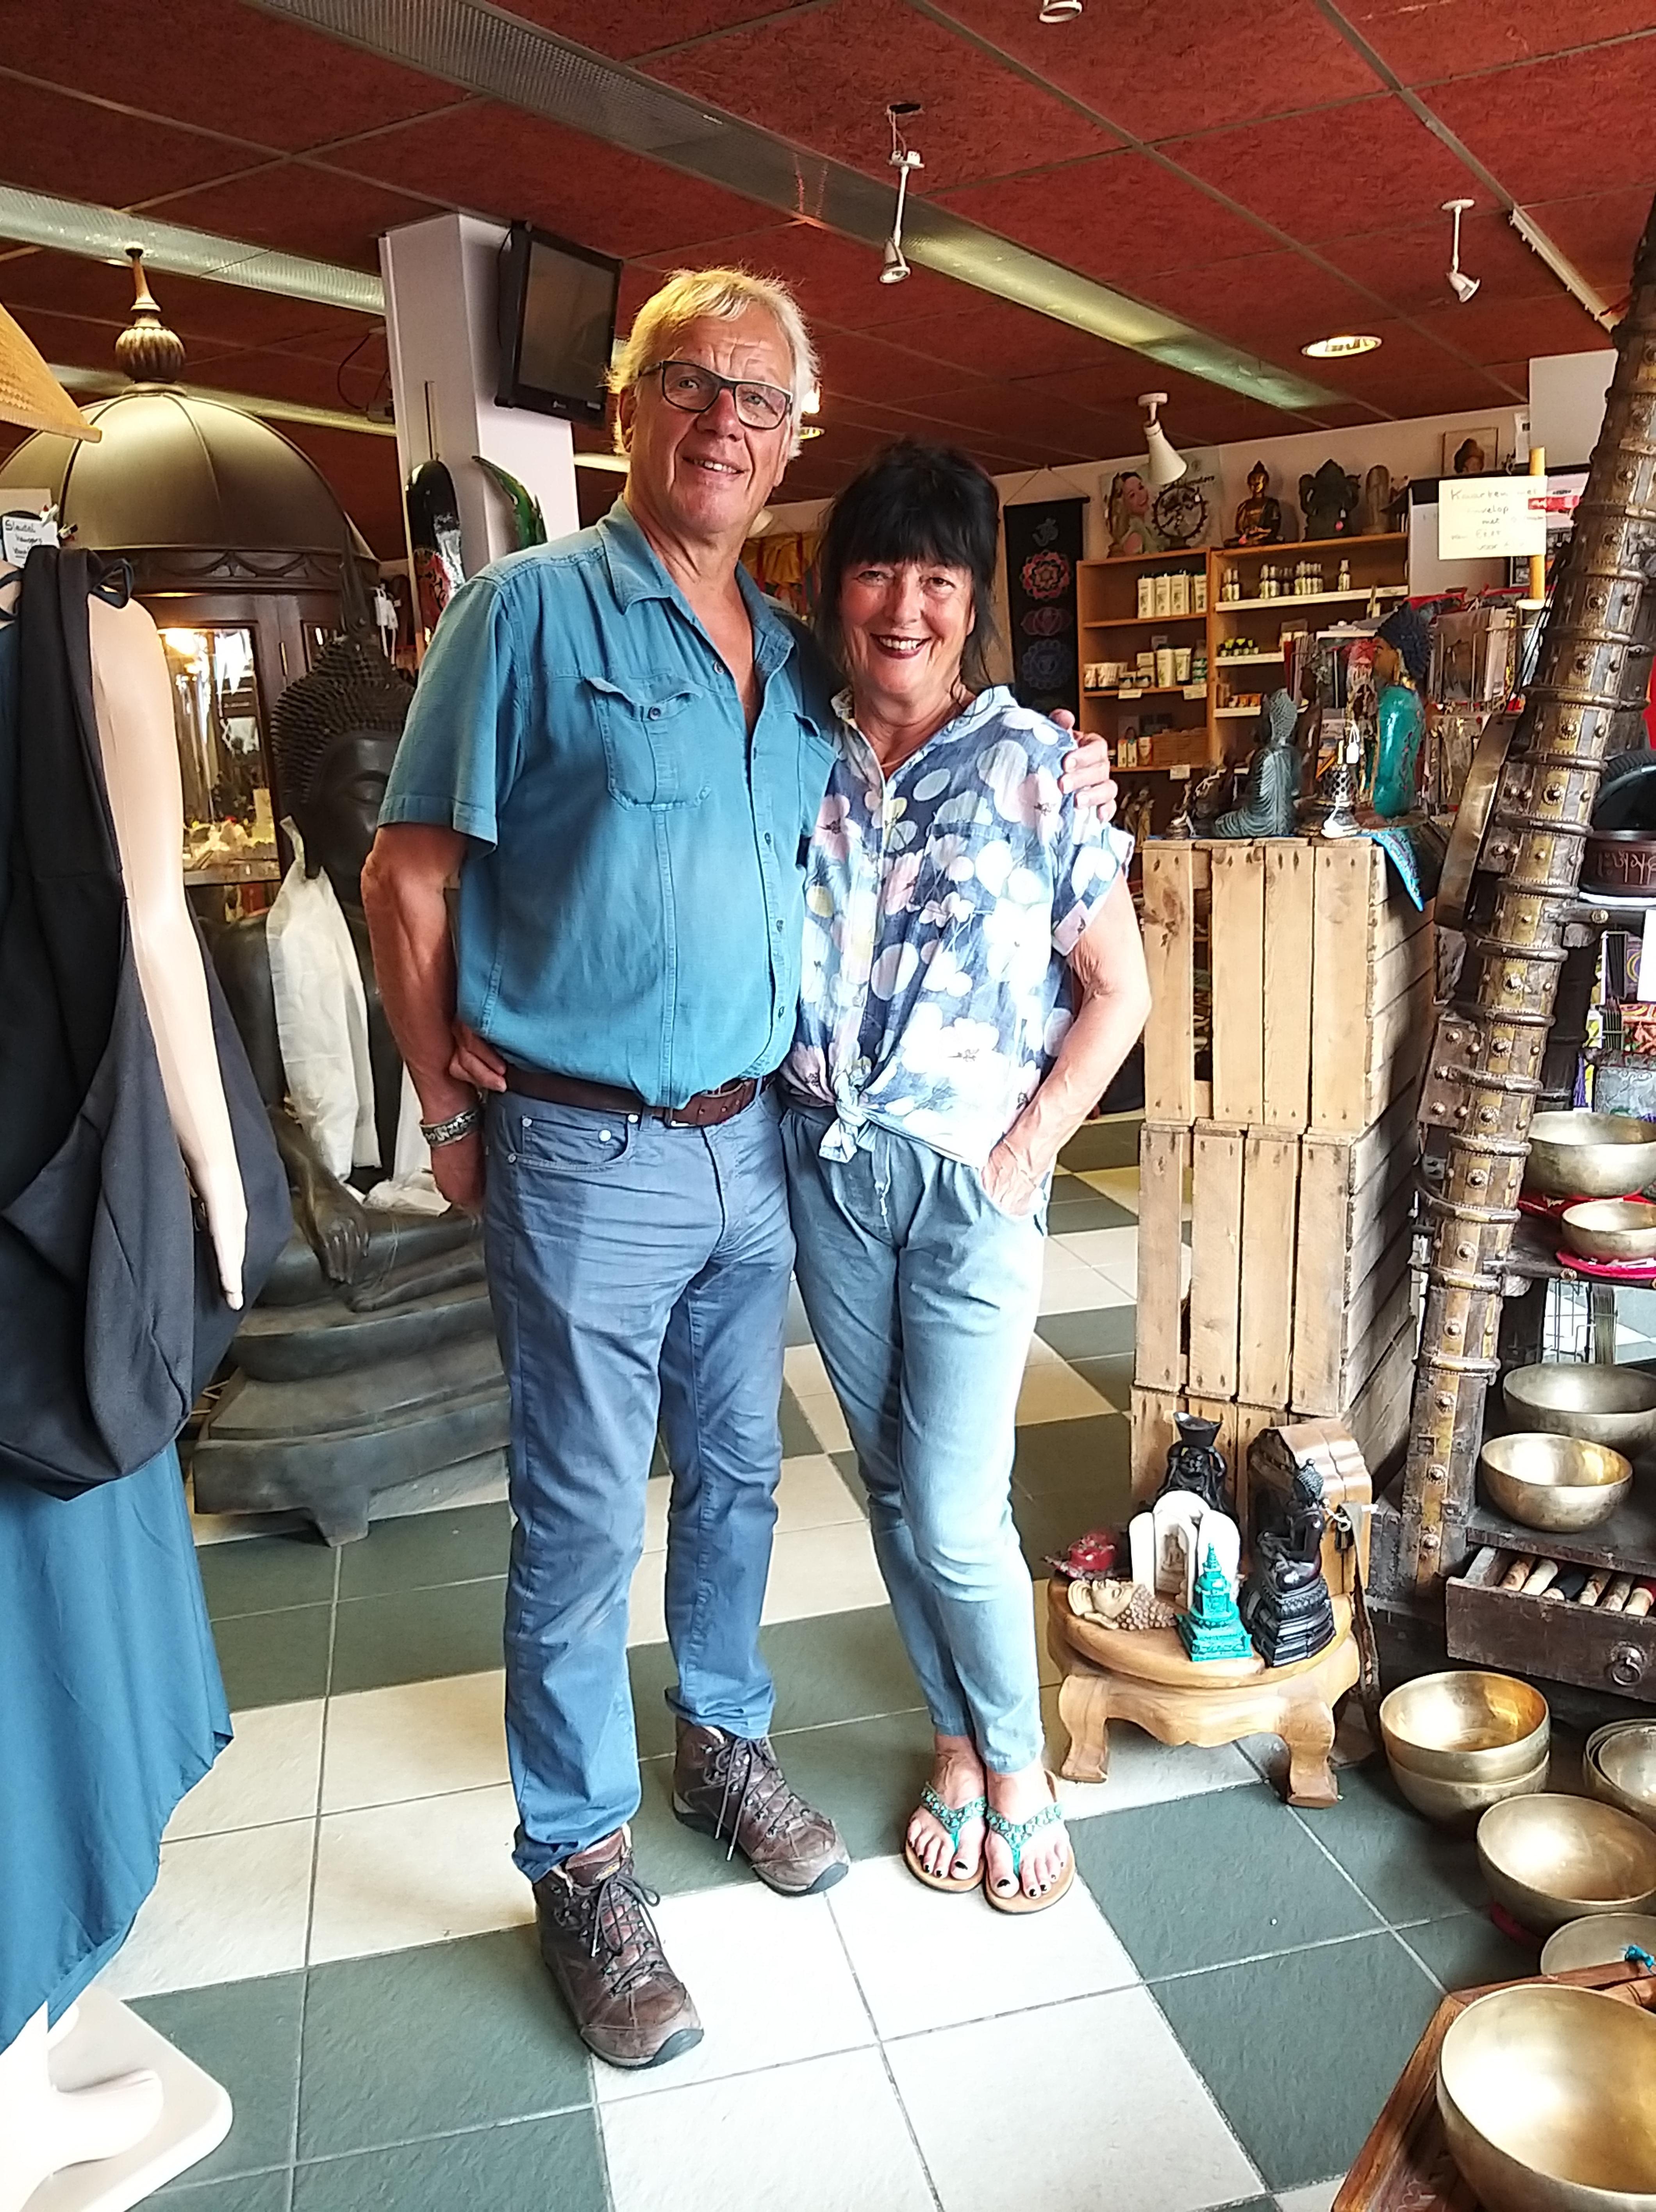 Anke en Ad Koop stoppen met hun winkeltje met speciale snuisterijen